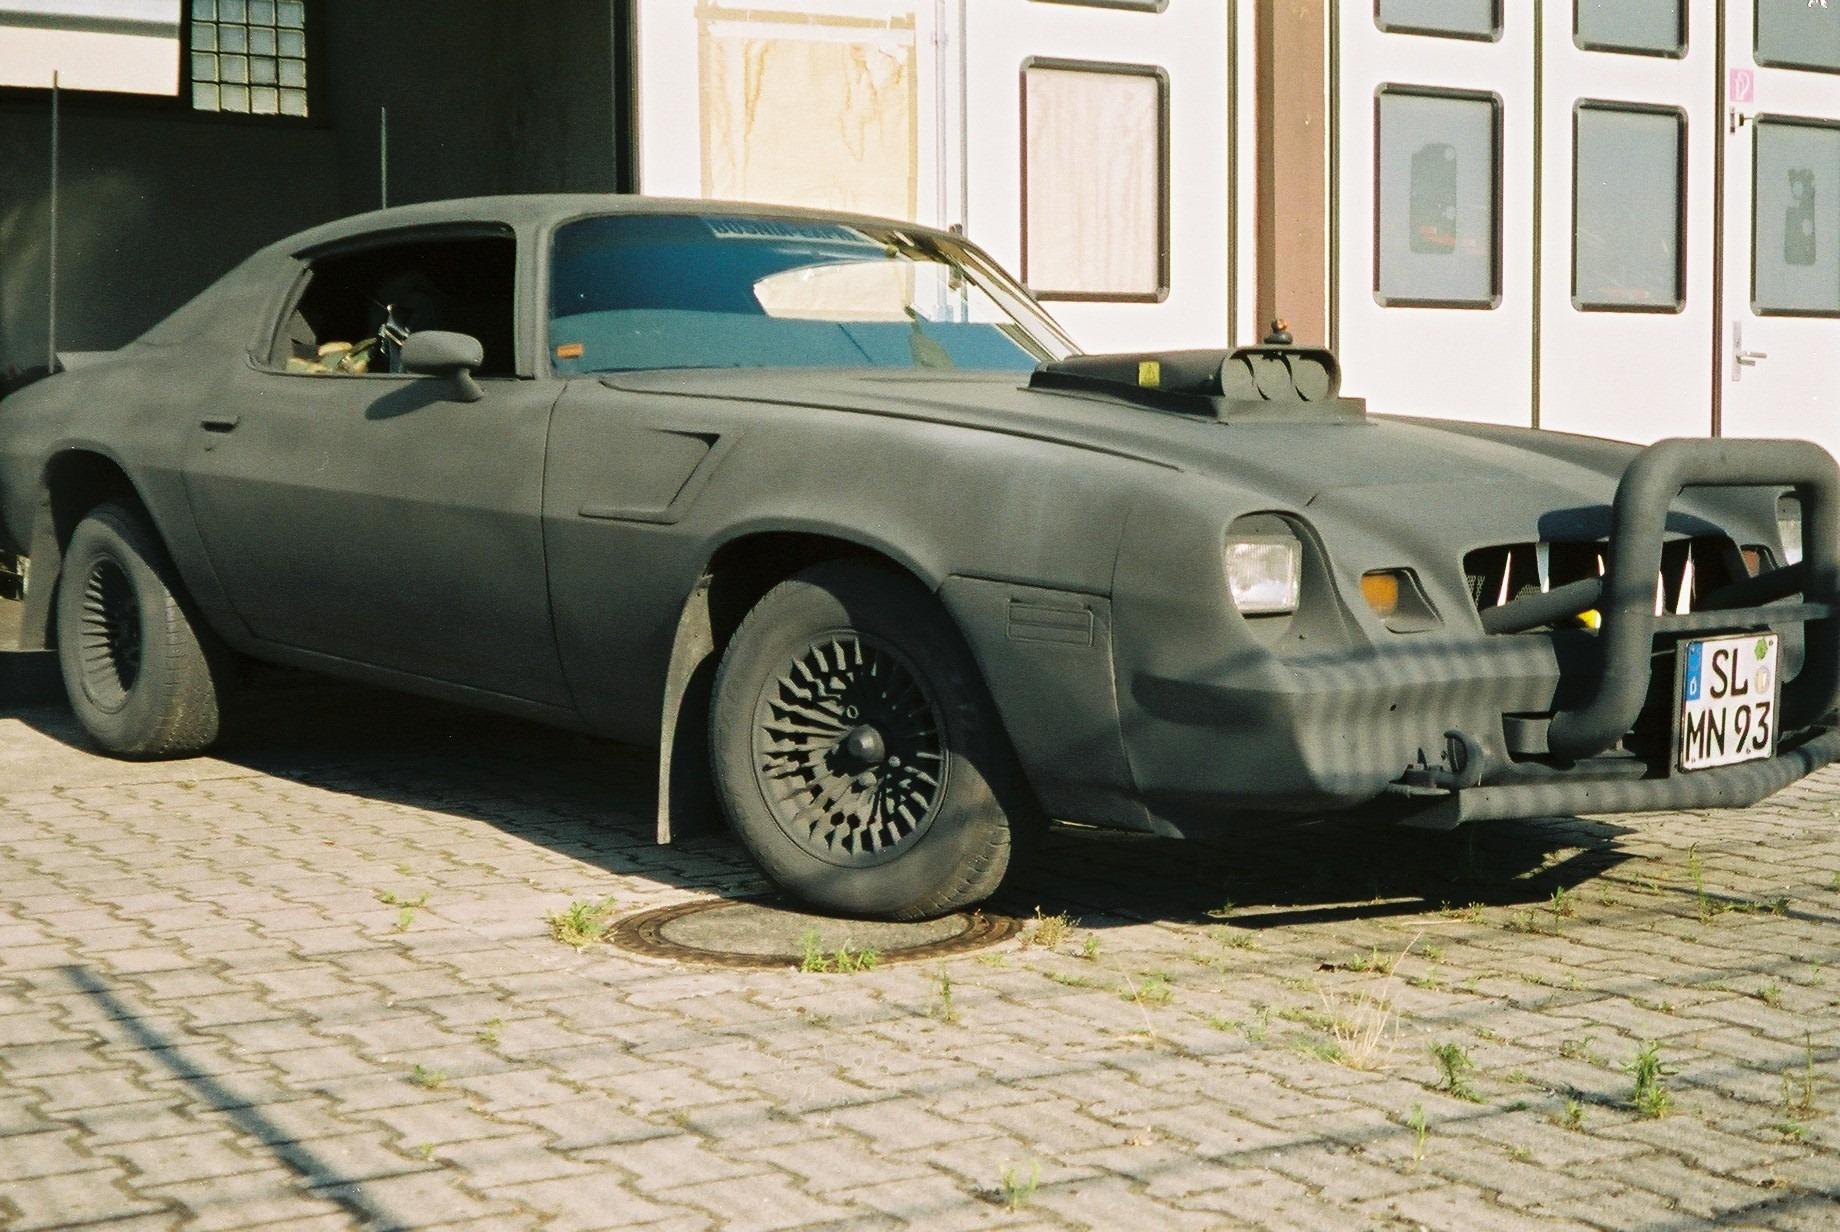 1979 Chevrolet War Camaro front three-quarter